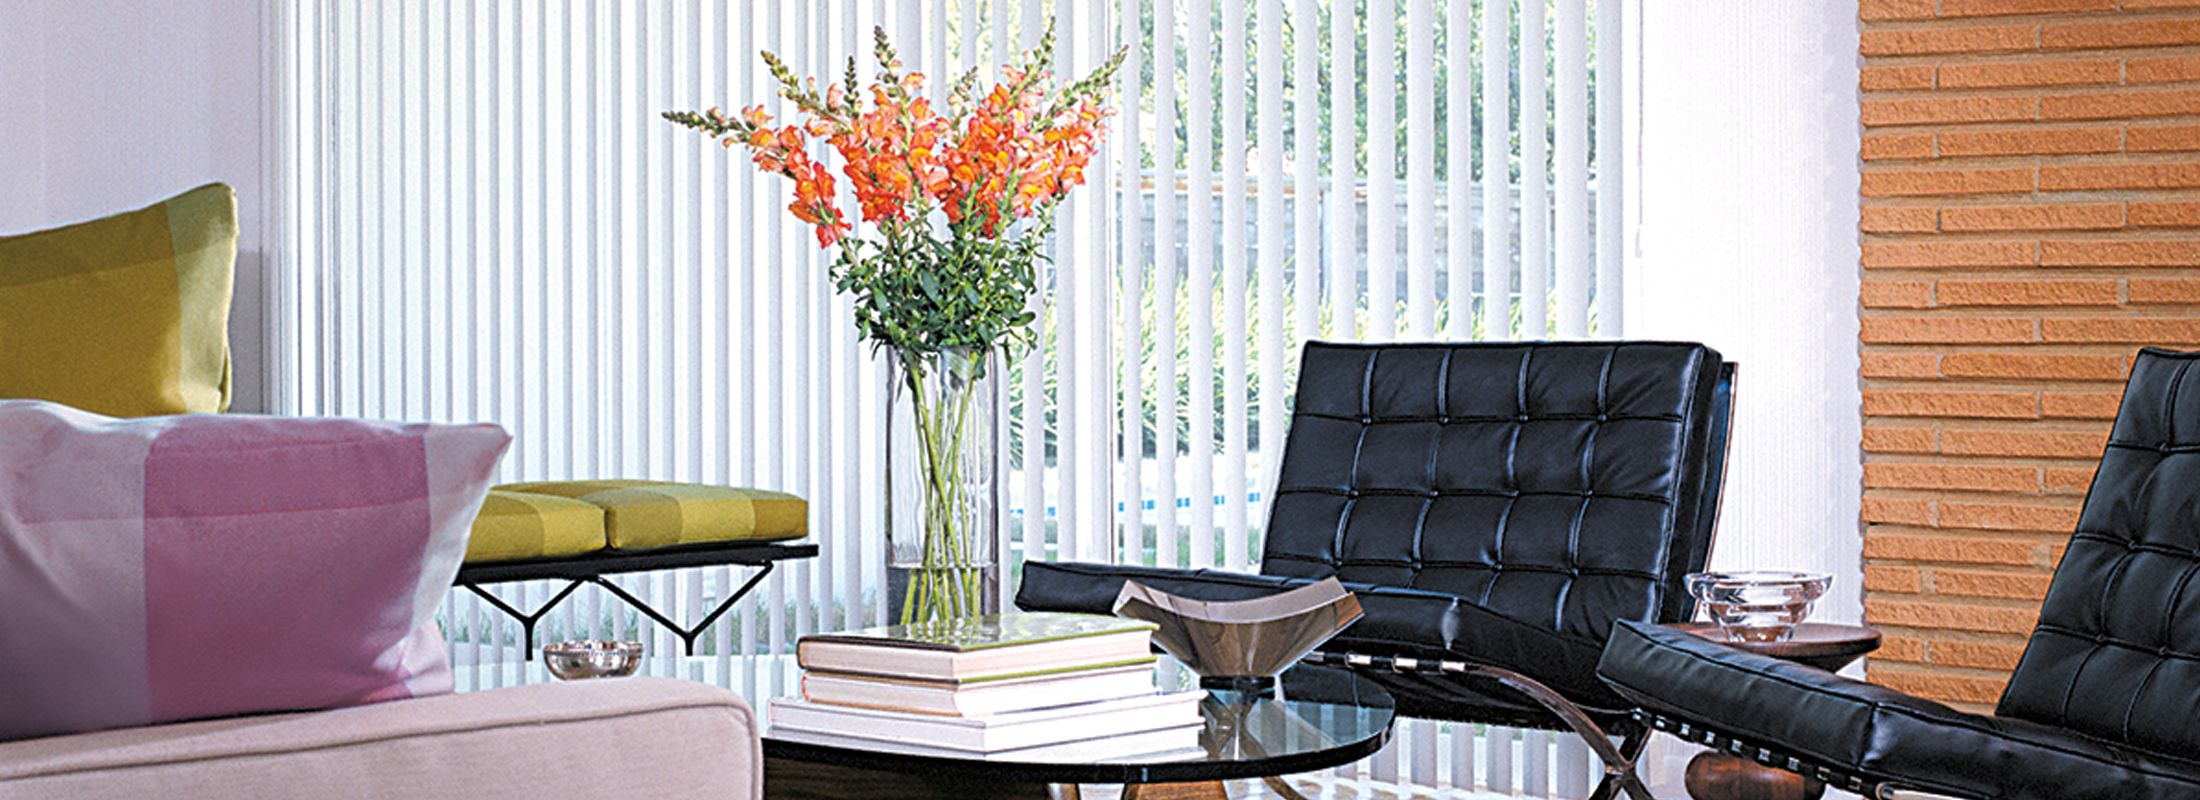 economical-vertical-blinds-vertical-solutions-carousel-01_0.jpg